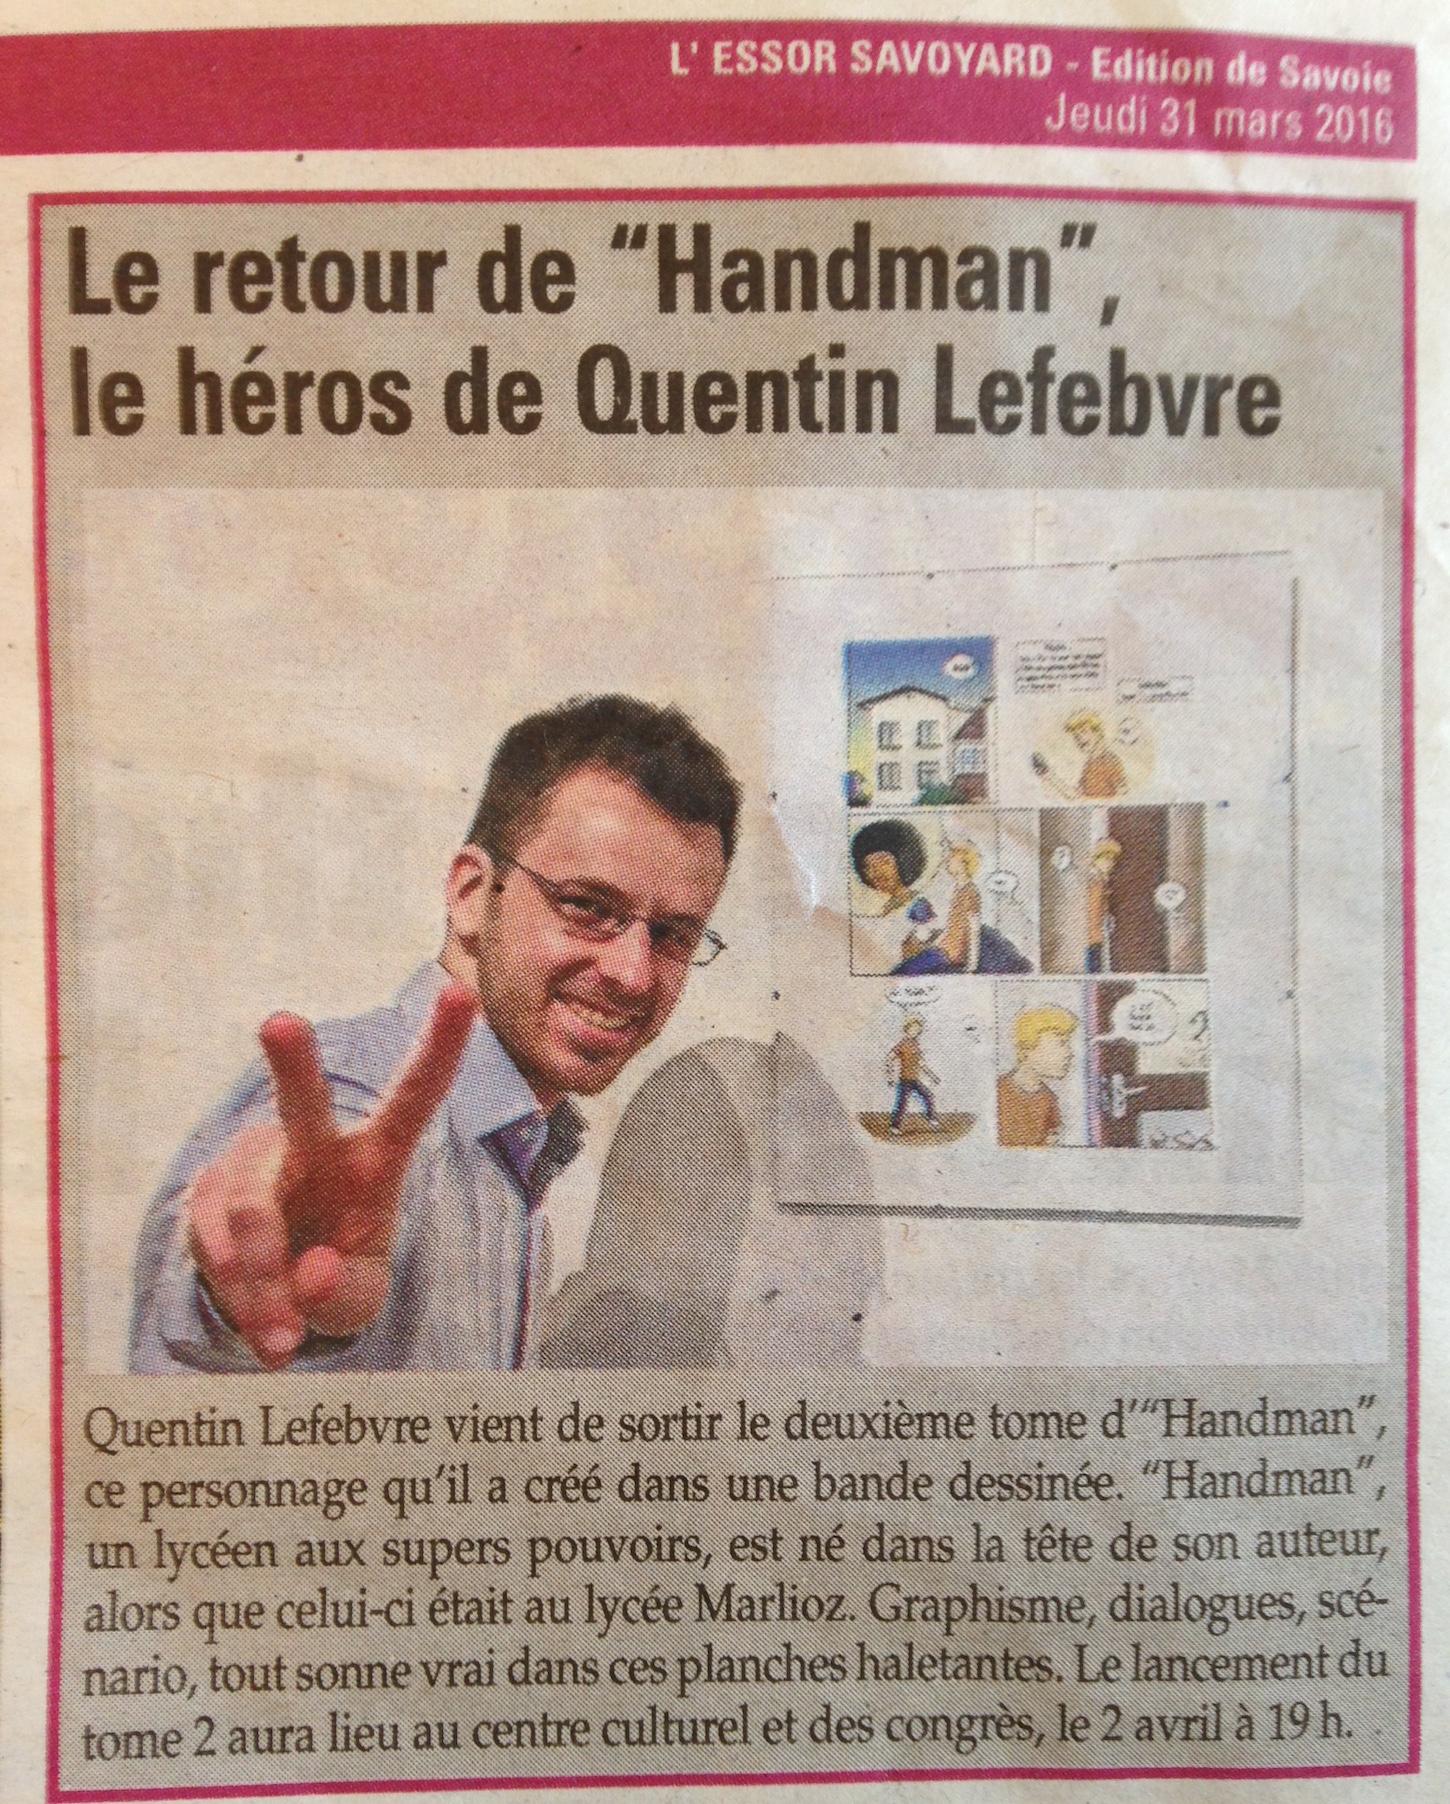 article essor savoyard 31mars2016 handman2